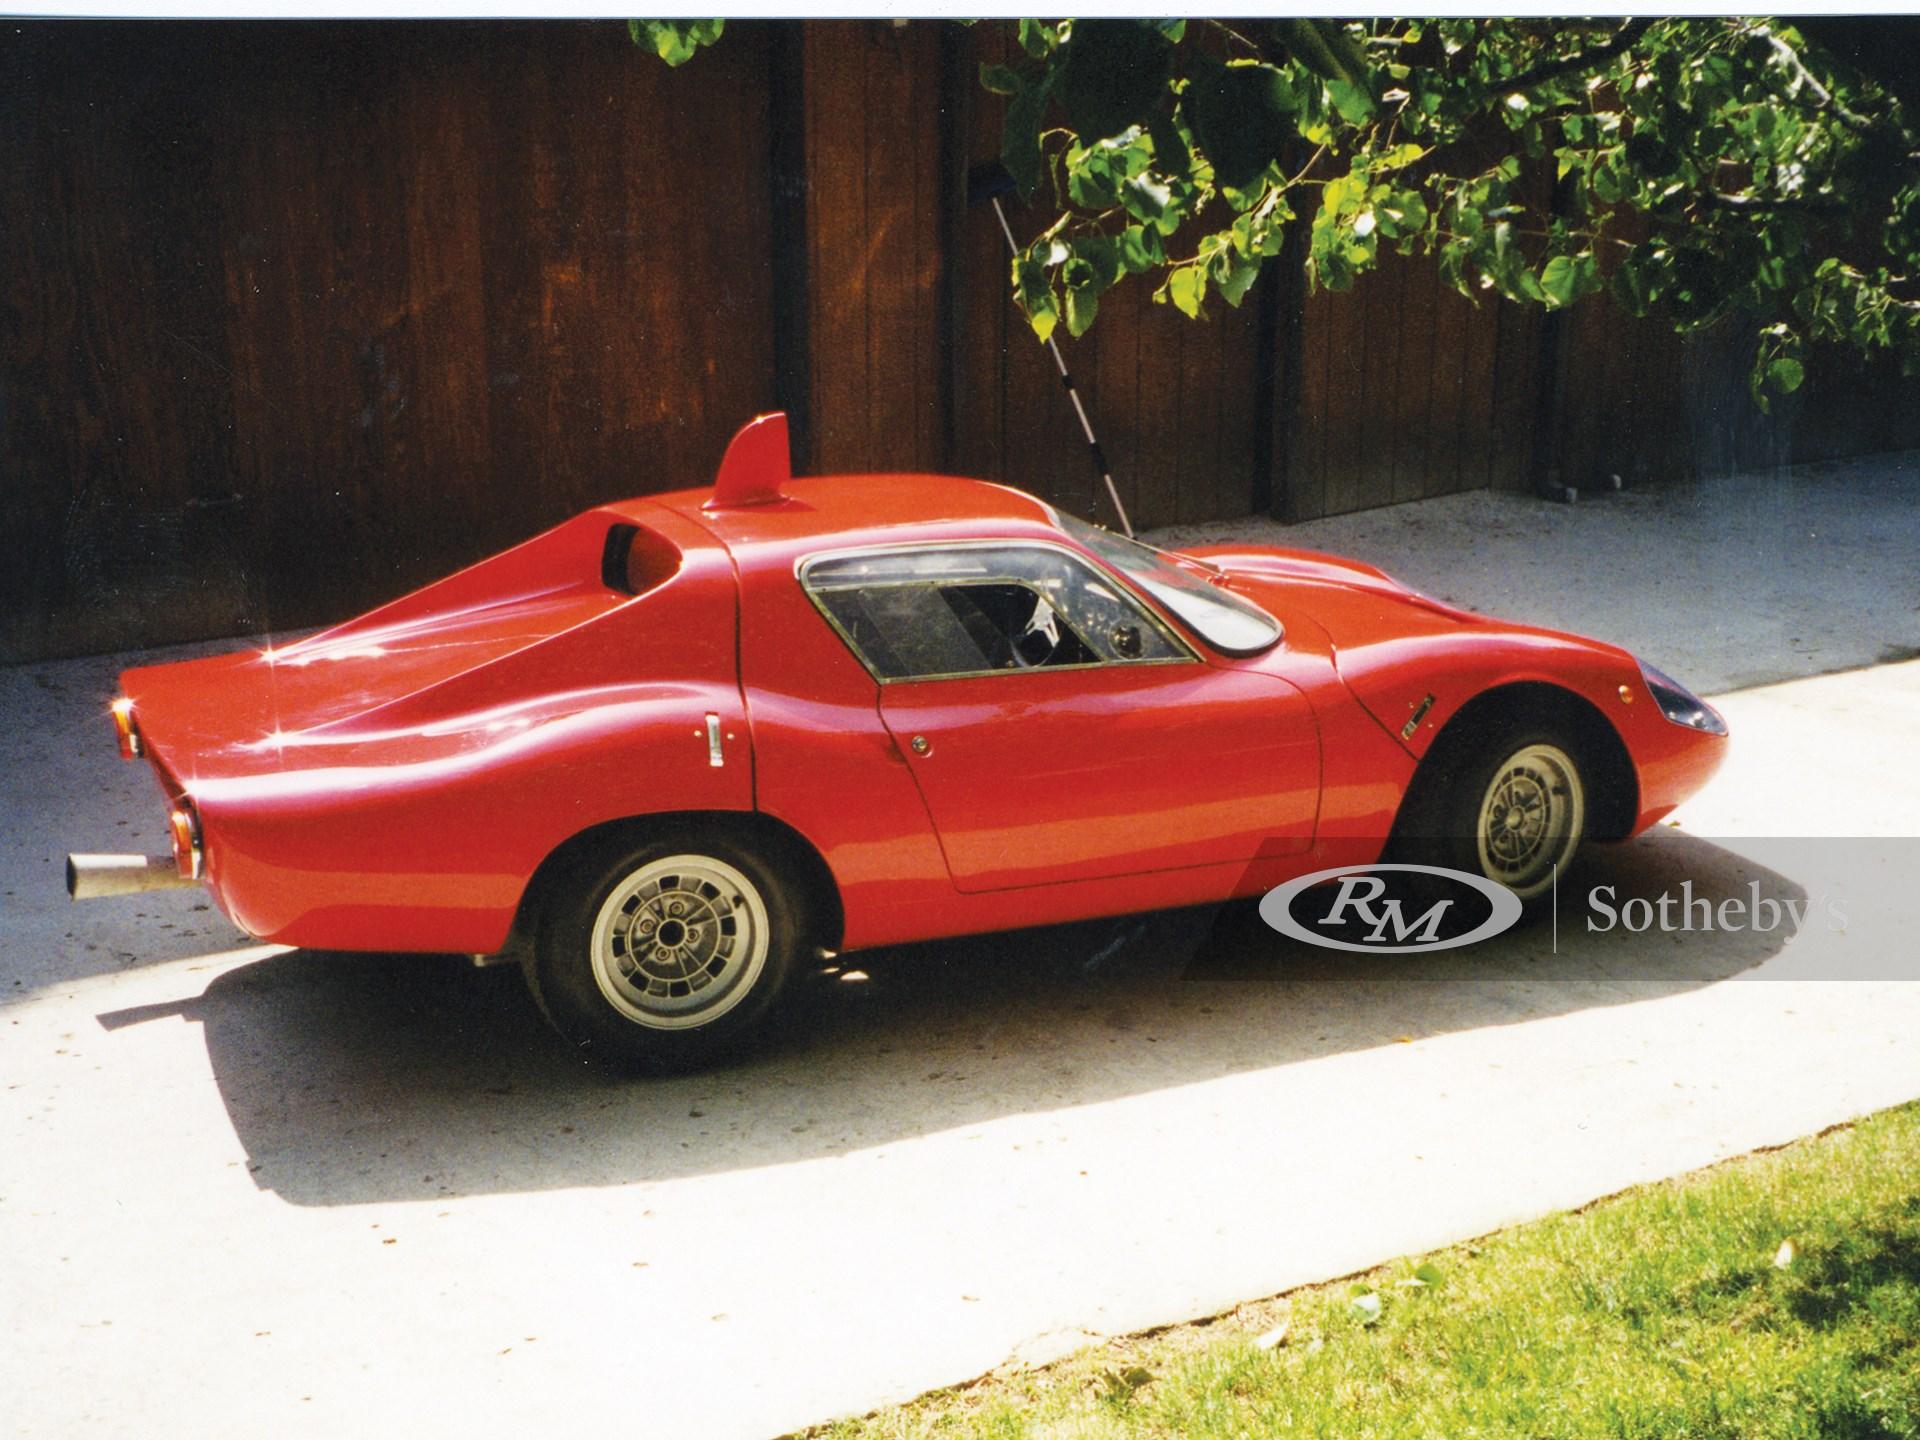 1966 Fiat-Abarth OT 1300 Factory Race Car